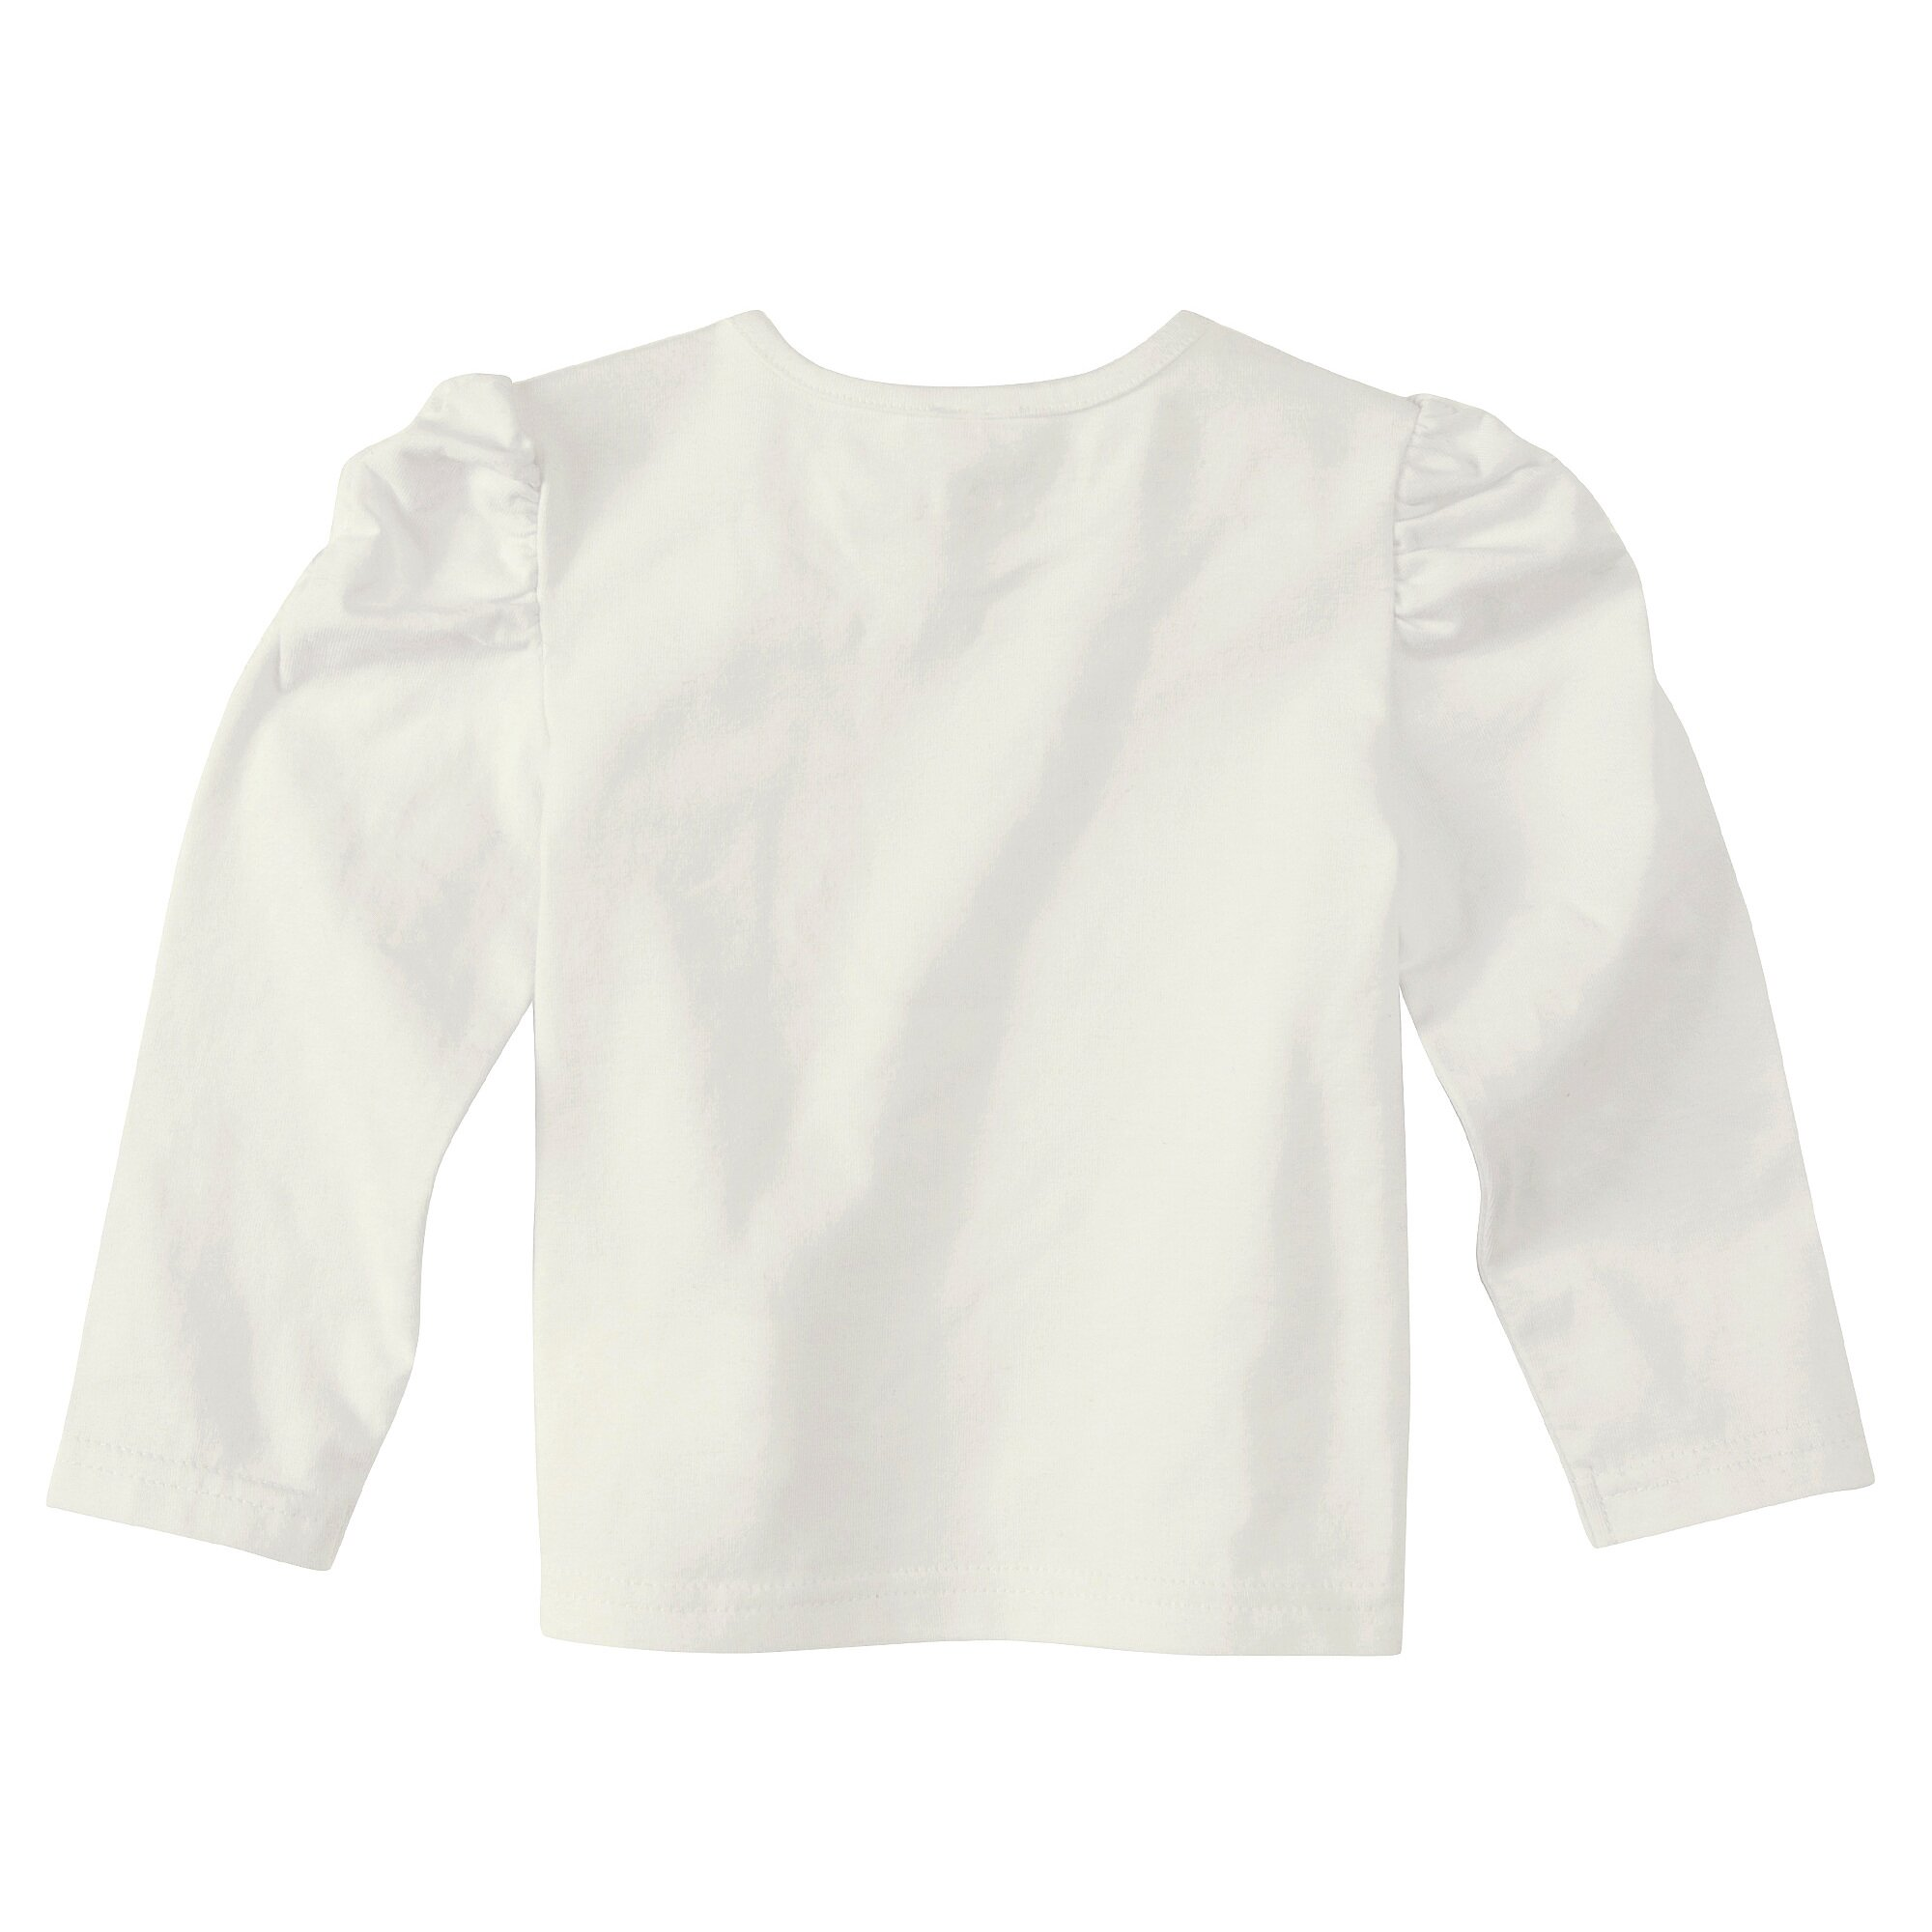 basics-shirt-langarm, 6.99 EUR @ babywalz-de